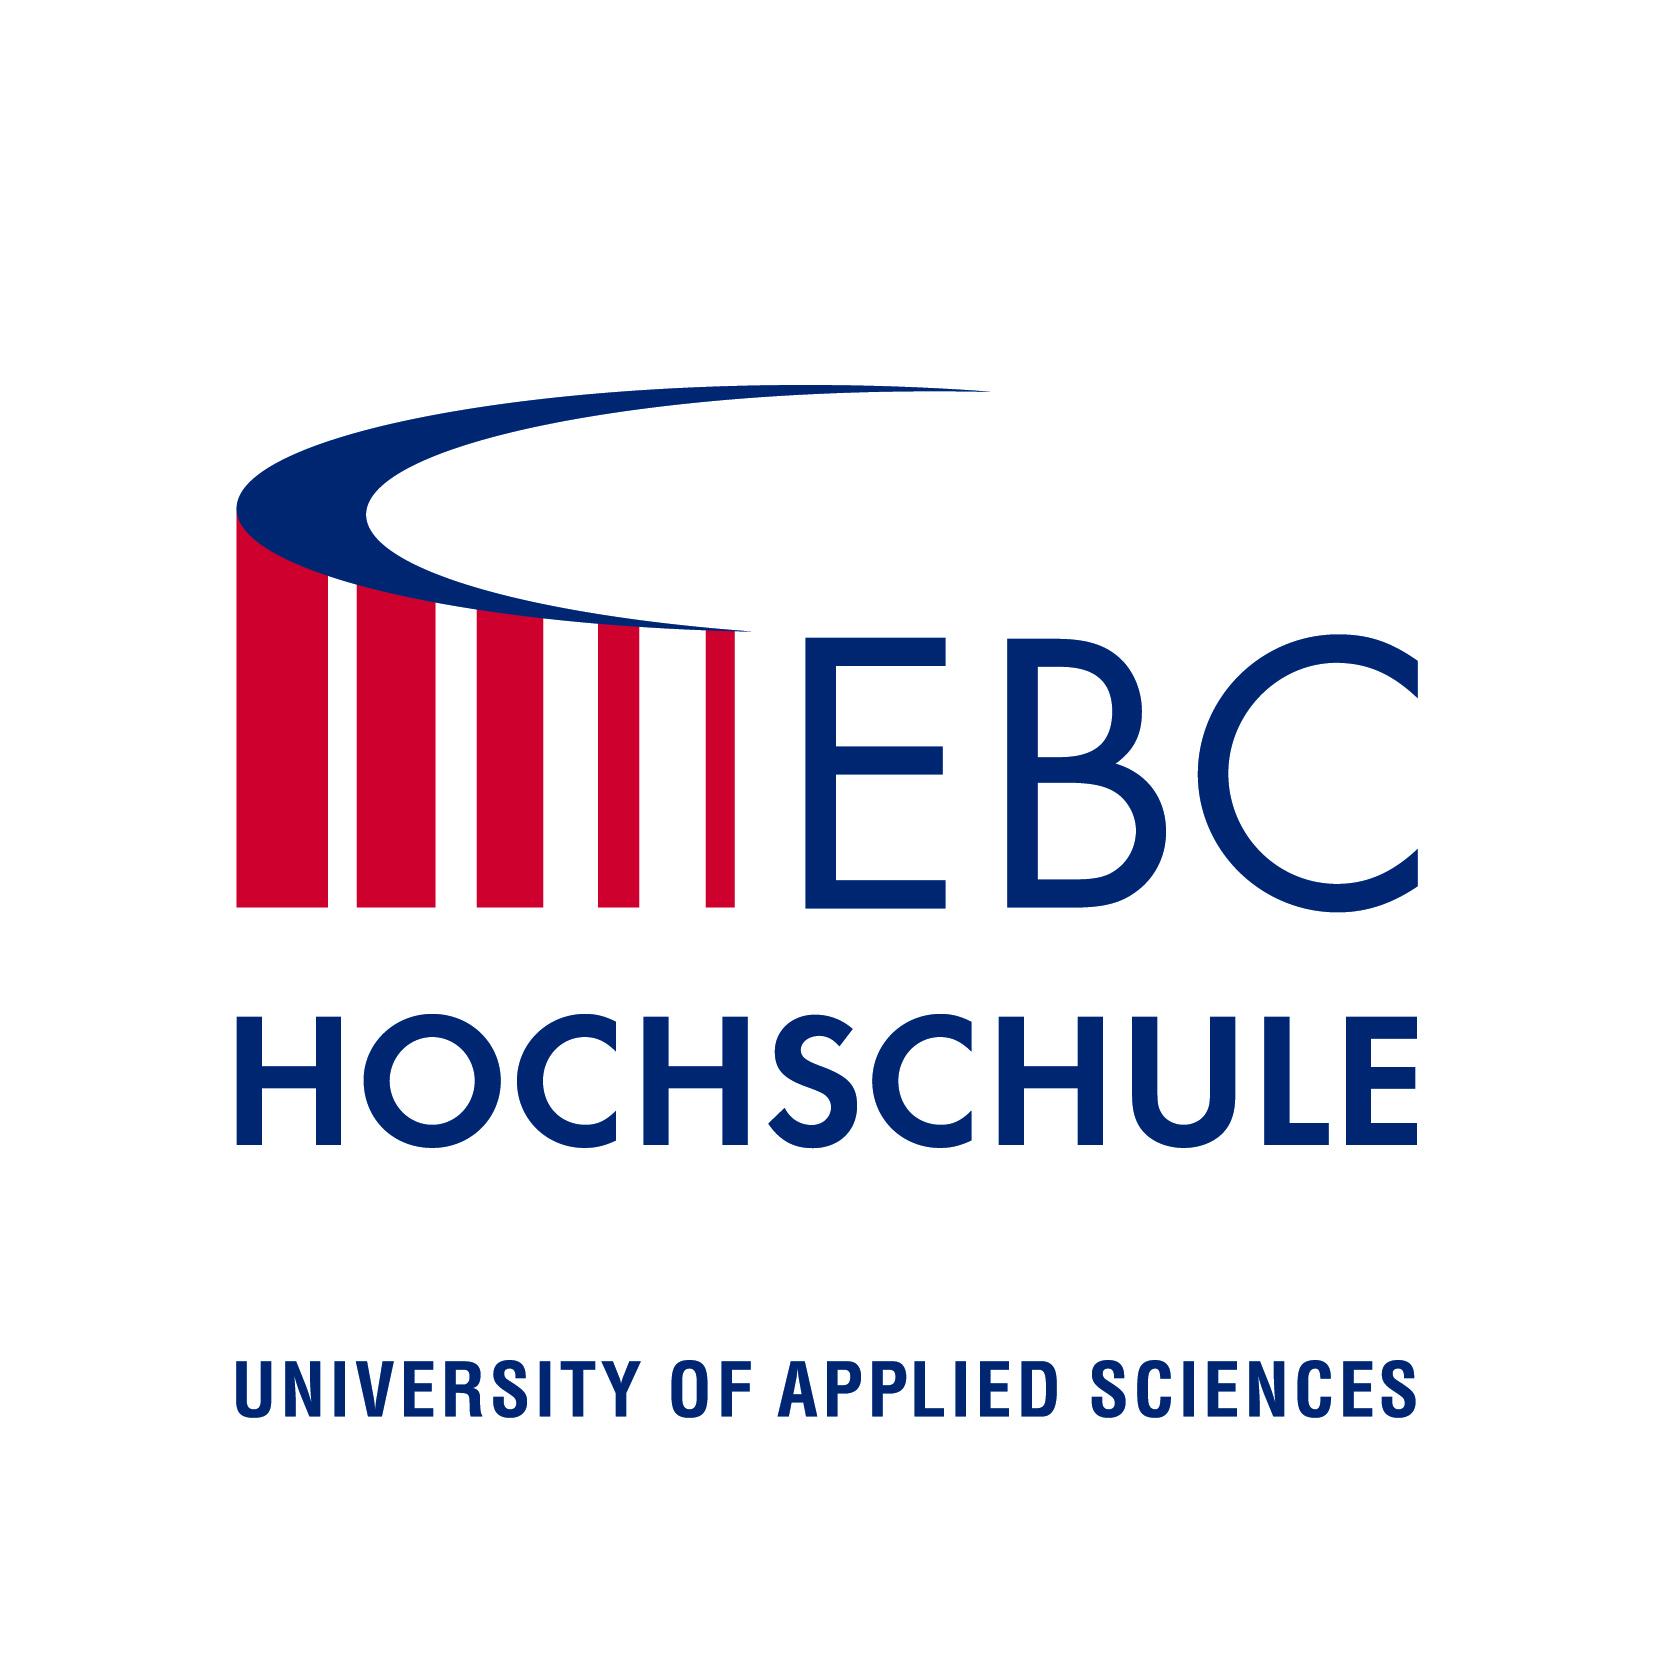 EBC Hochschule Campus Berlin